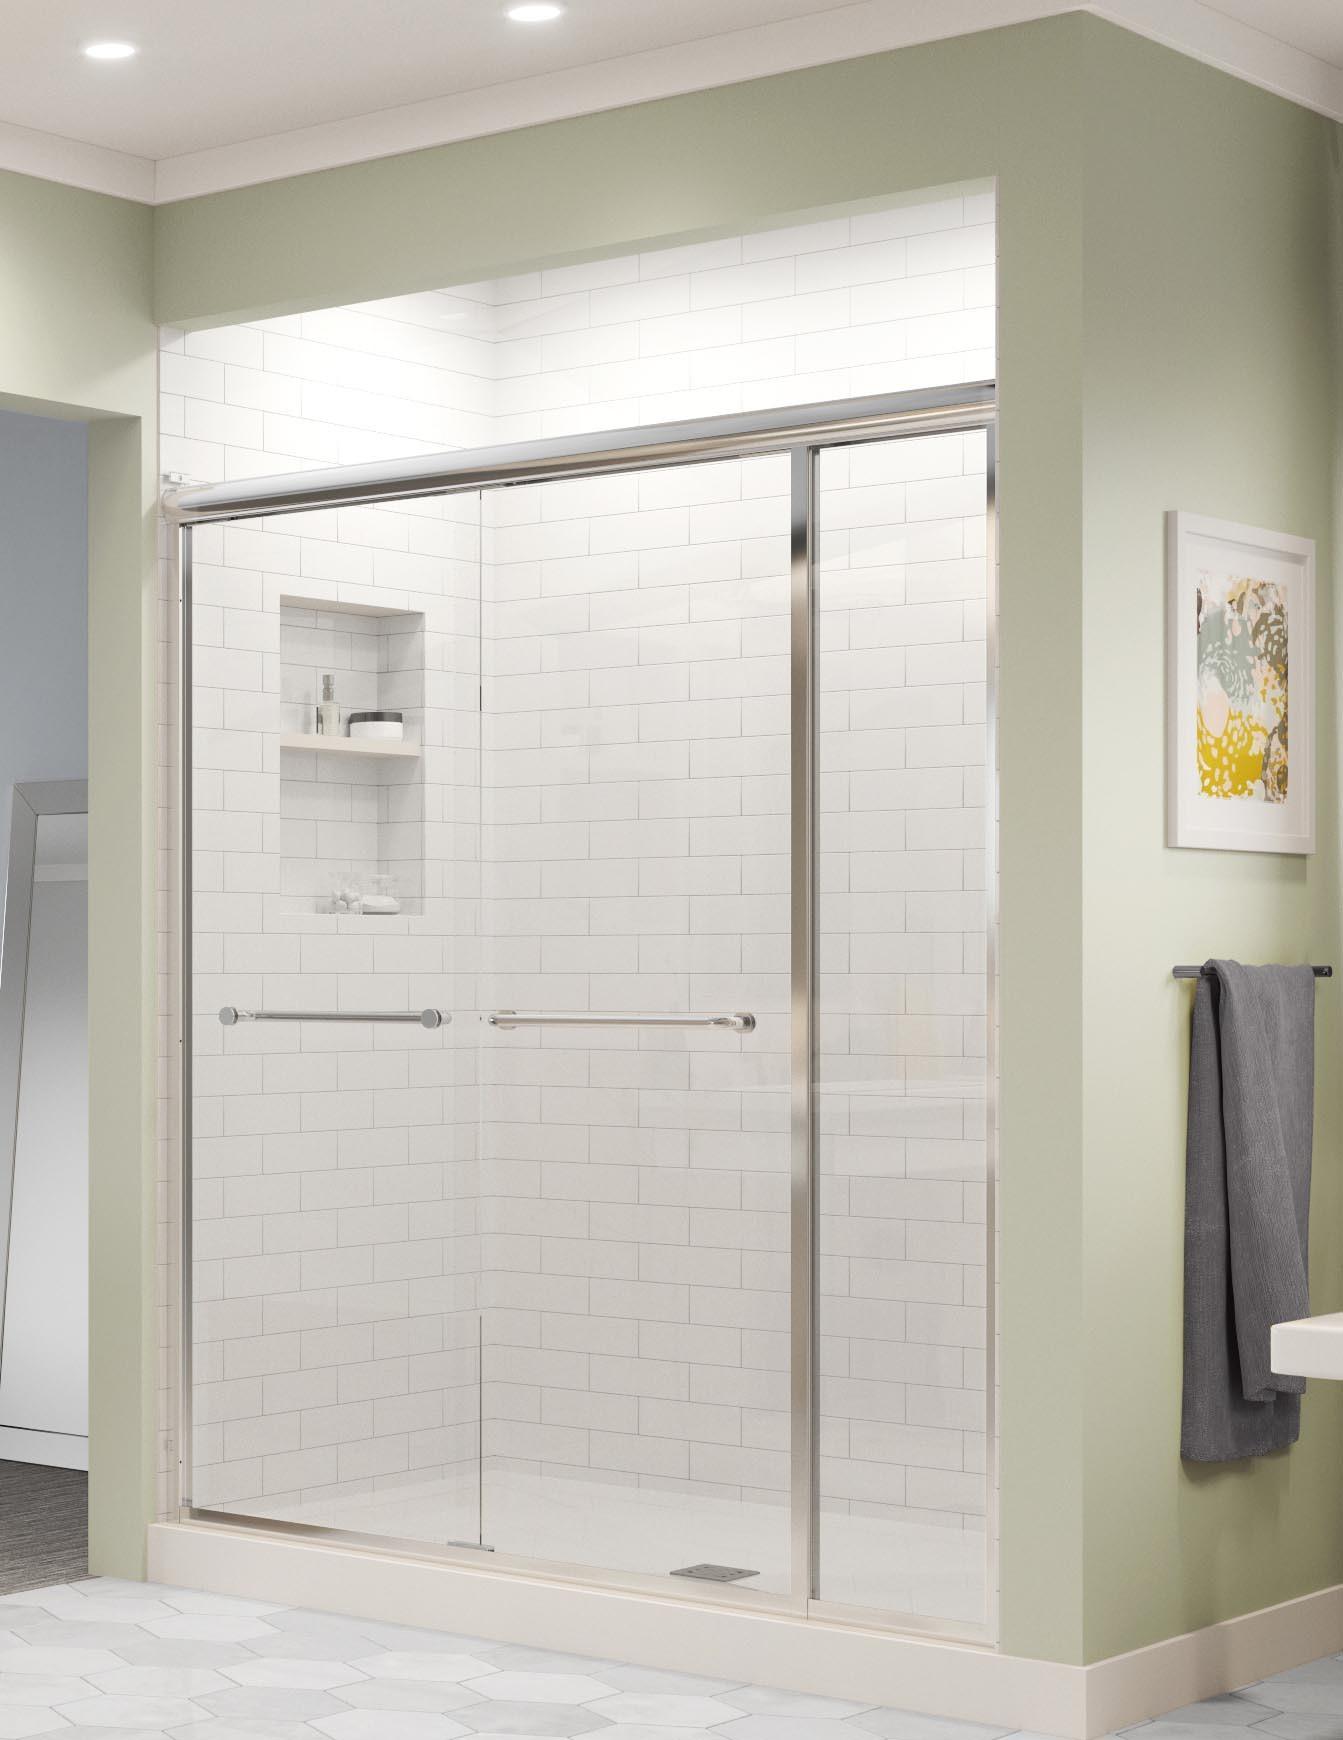 Infinity Semi Frameless 1 4 Inch Glass Sliding With Inline Panel Shower Door Basco Shower Doors